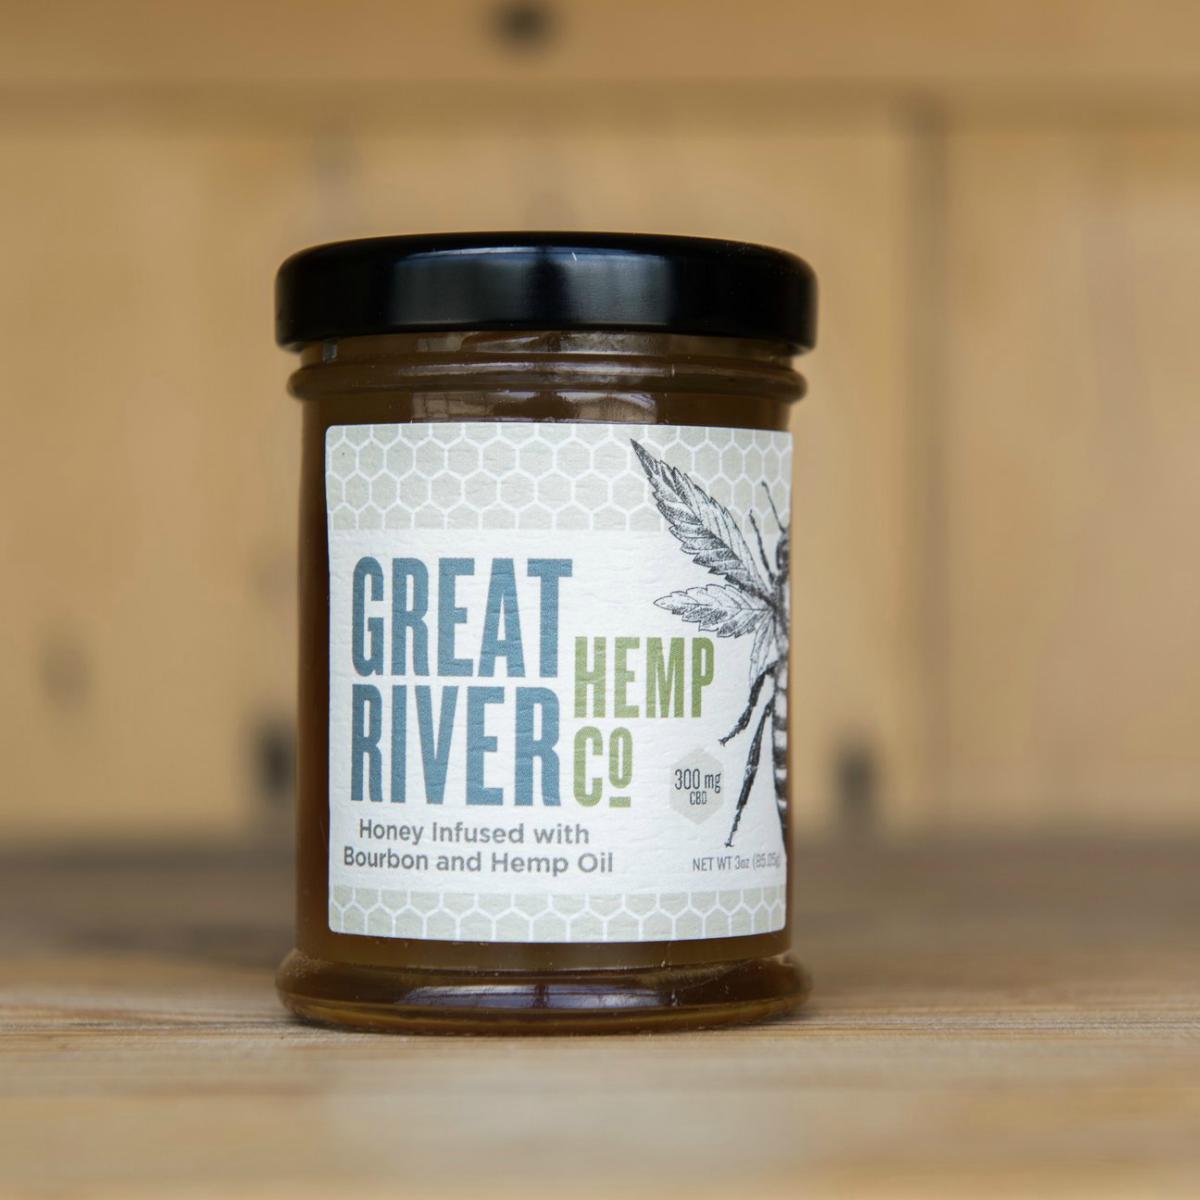 Savannah Bee Company Wild Flower Honey